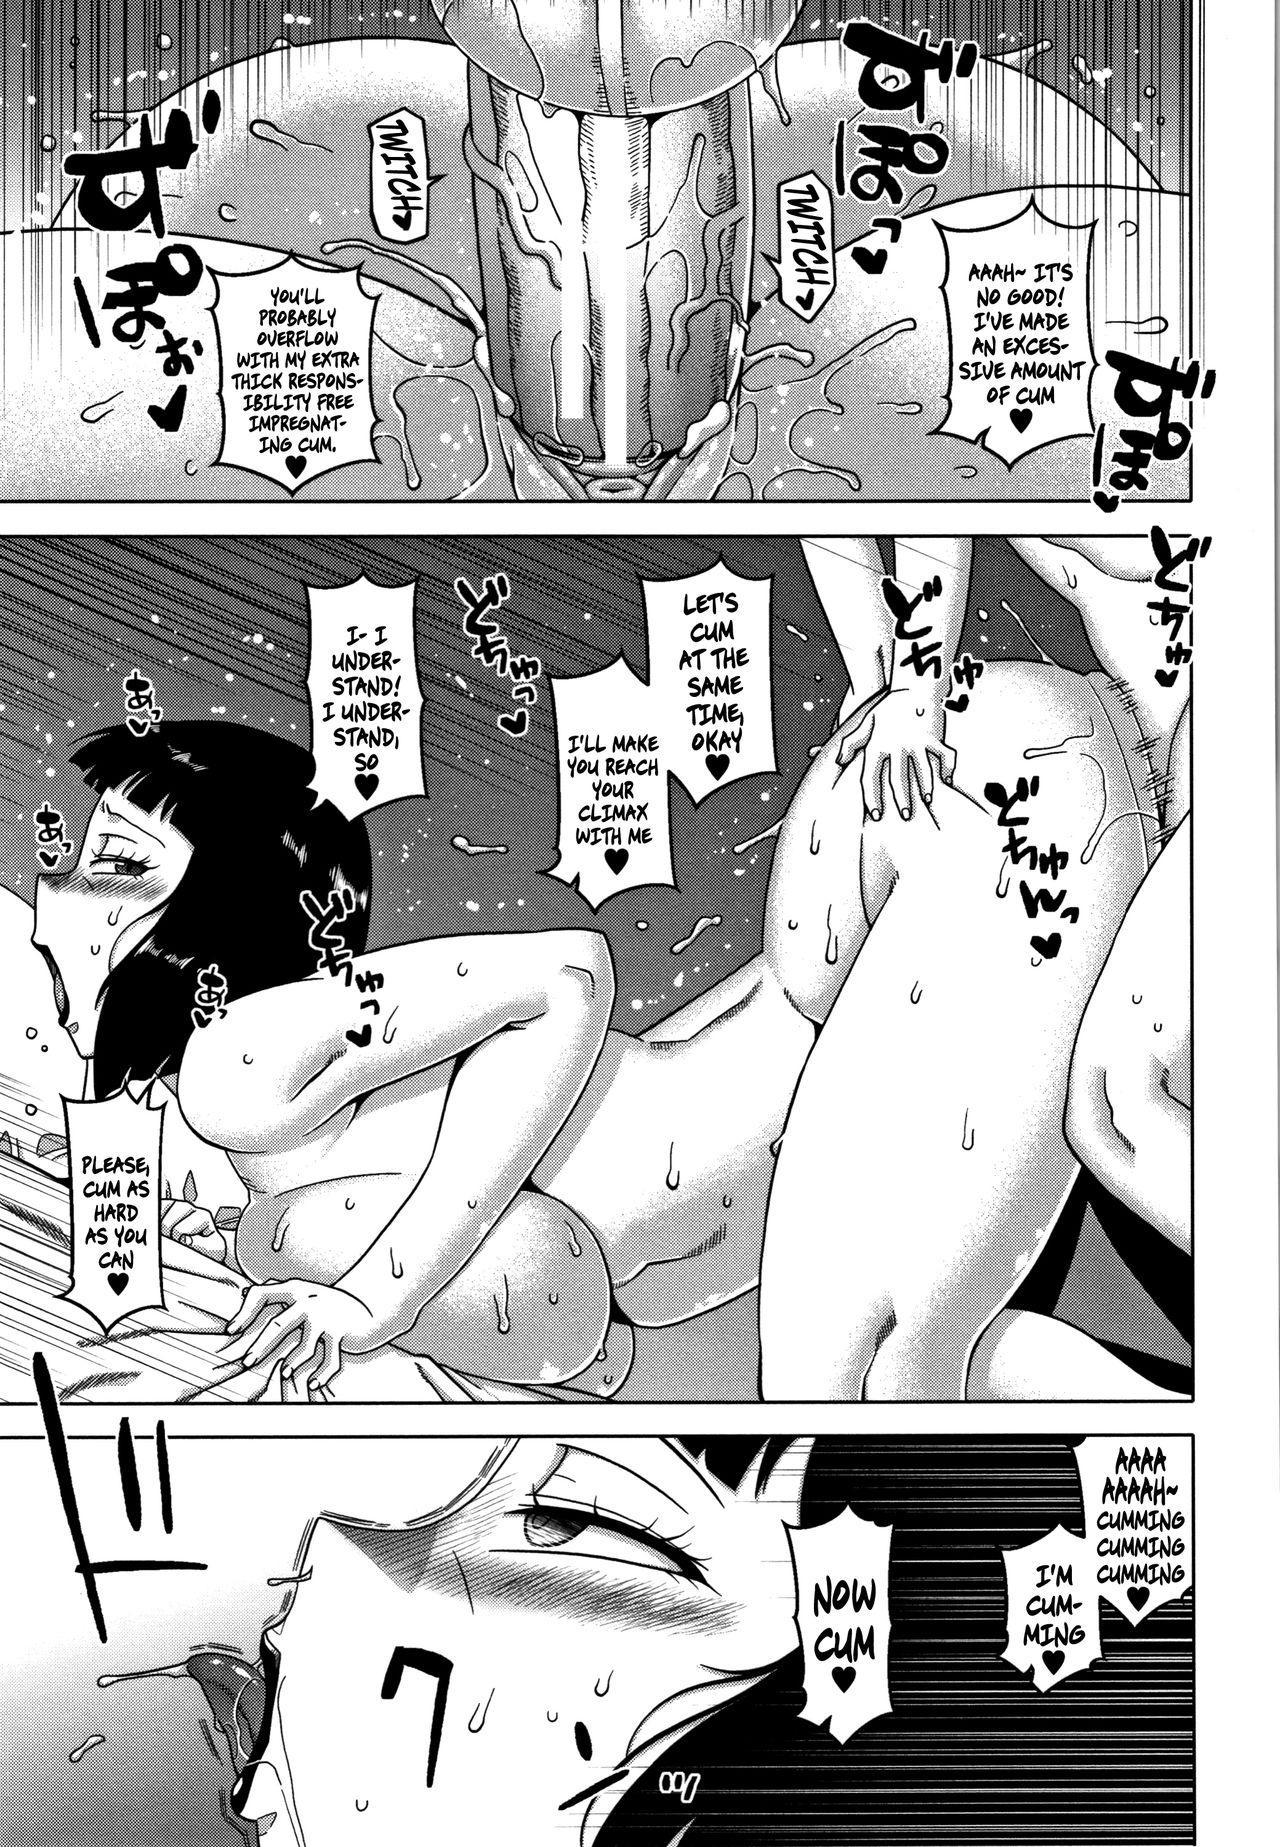 [Takatsu] Kami-sama no Iu Toori   As God Says Ch. 1-2 [English] [Secluded] 26